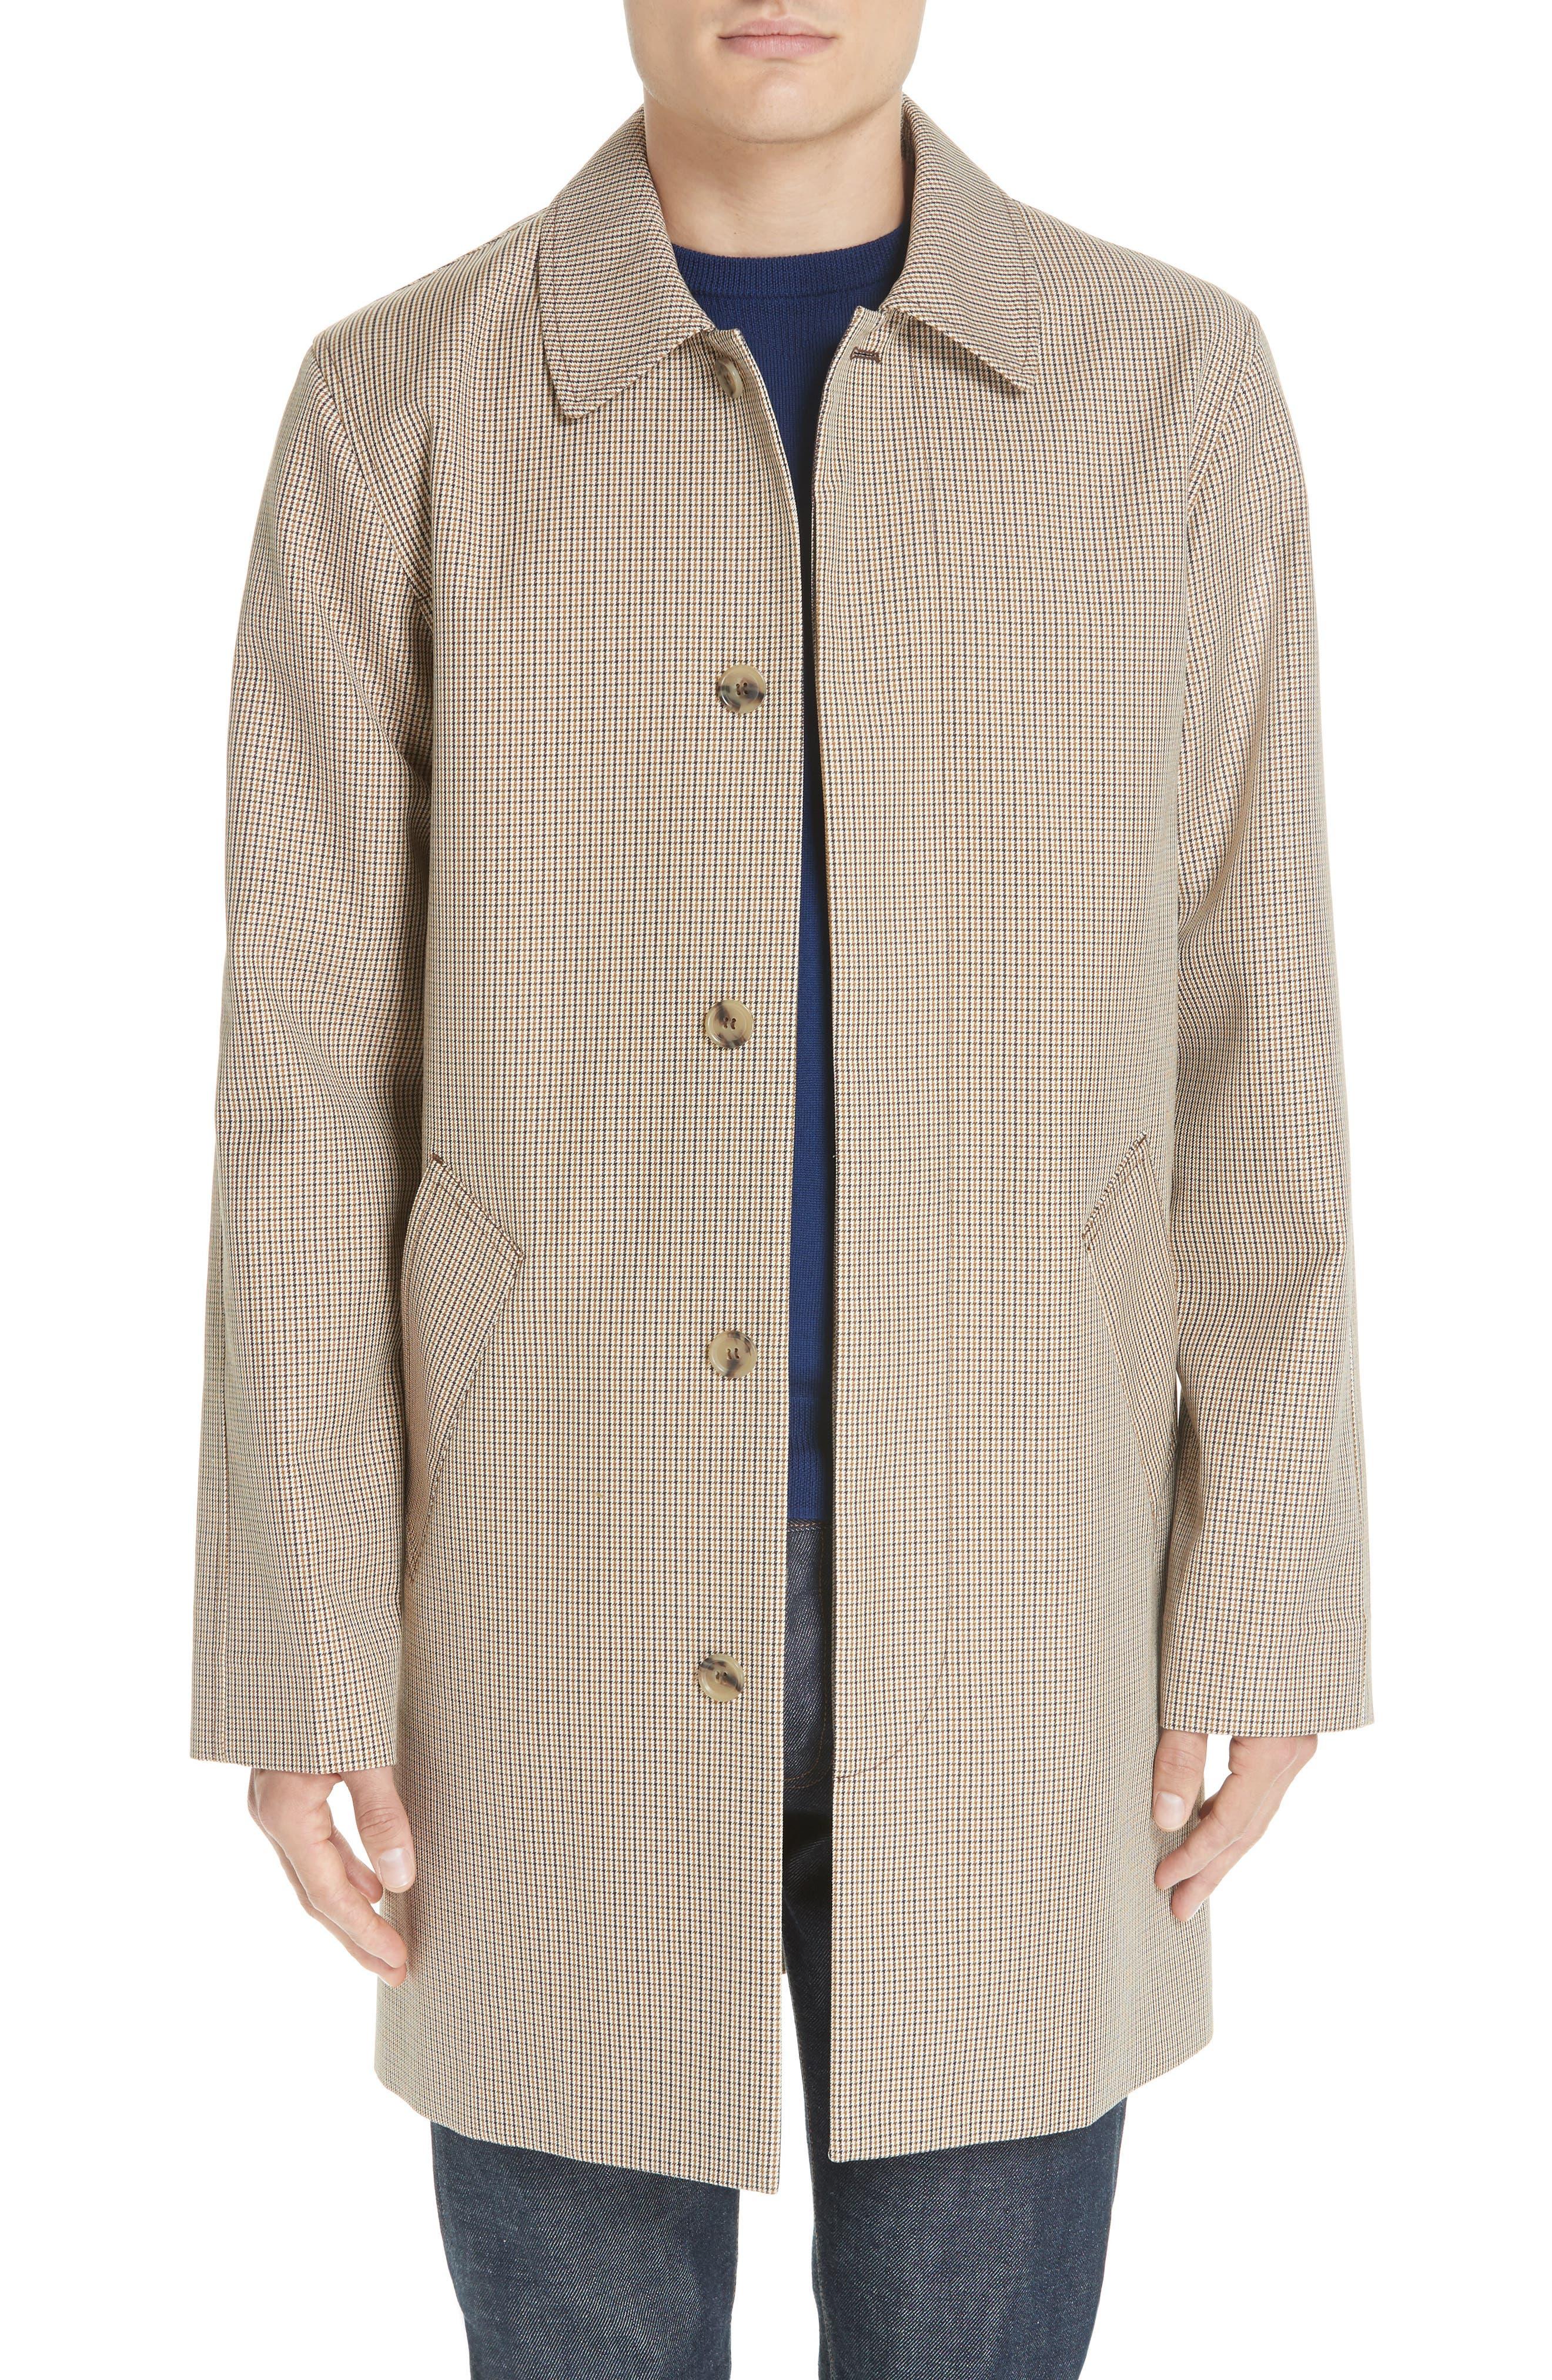 Puppytooth Check Mac Coat,                         Main,                         color, 251